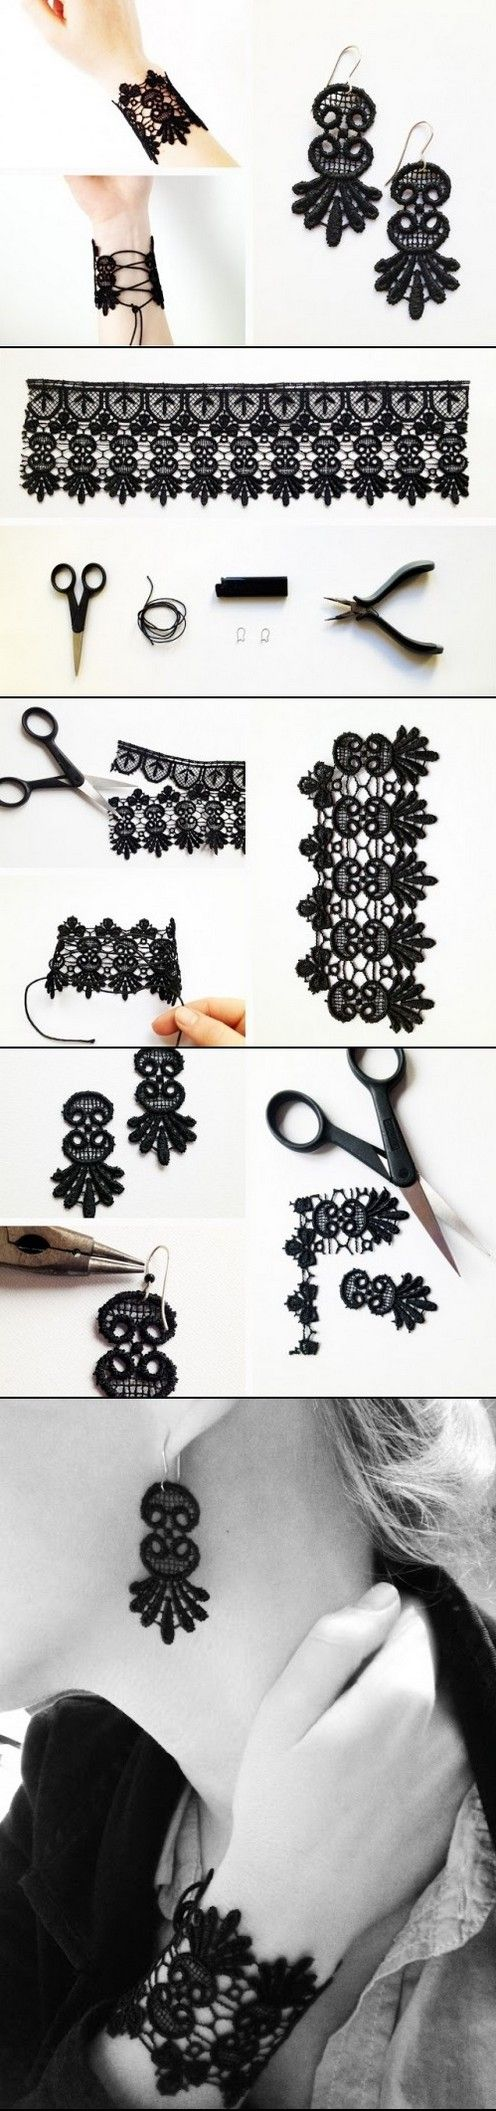 diy bracelets en tissu je fais moi m me. Black Bedroom Furniture Sets. Home Design Ideas